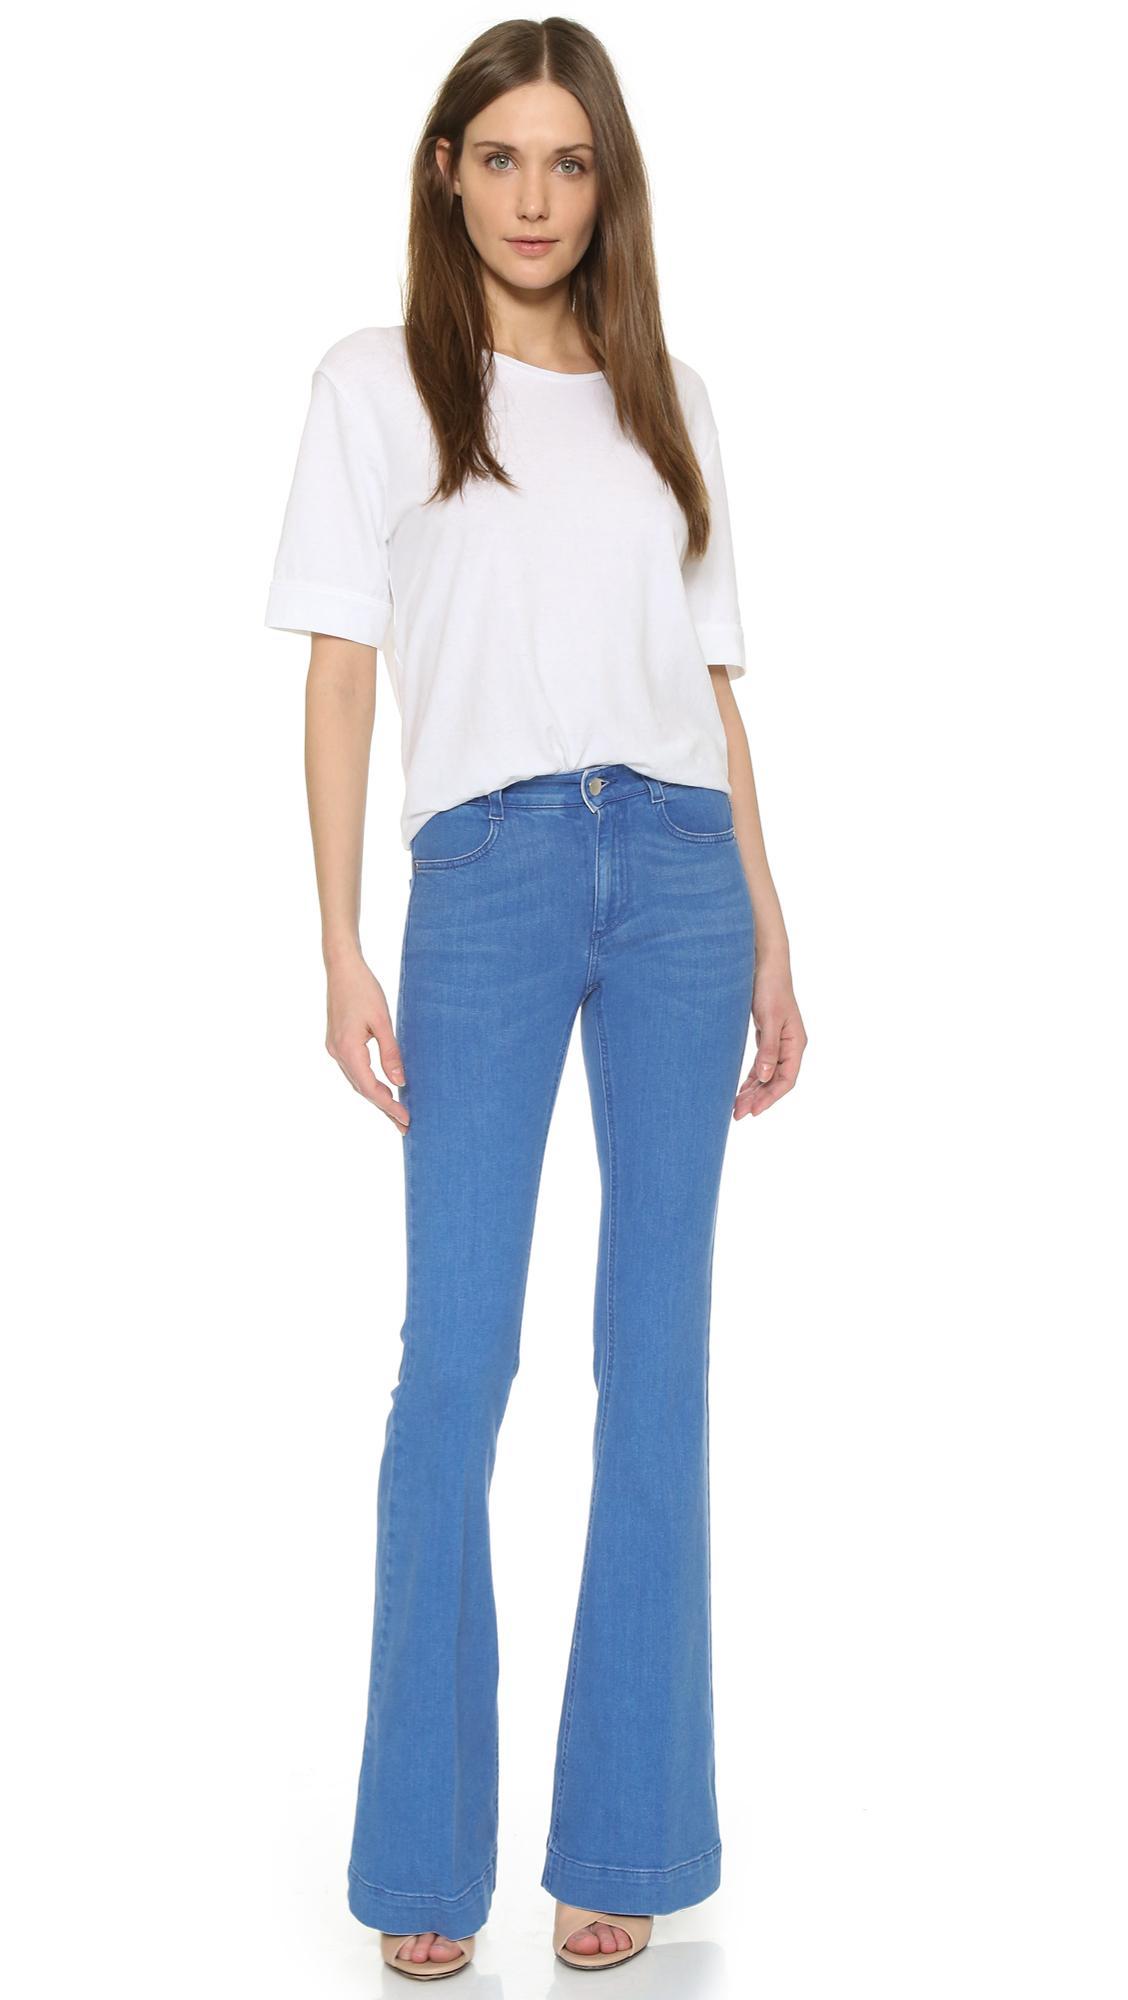 Stella McCartney Denim '70s Flare Jeans in Ultra Blue (Blue)